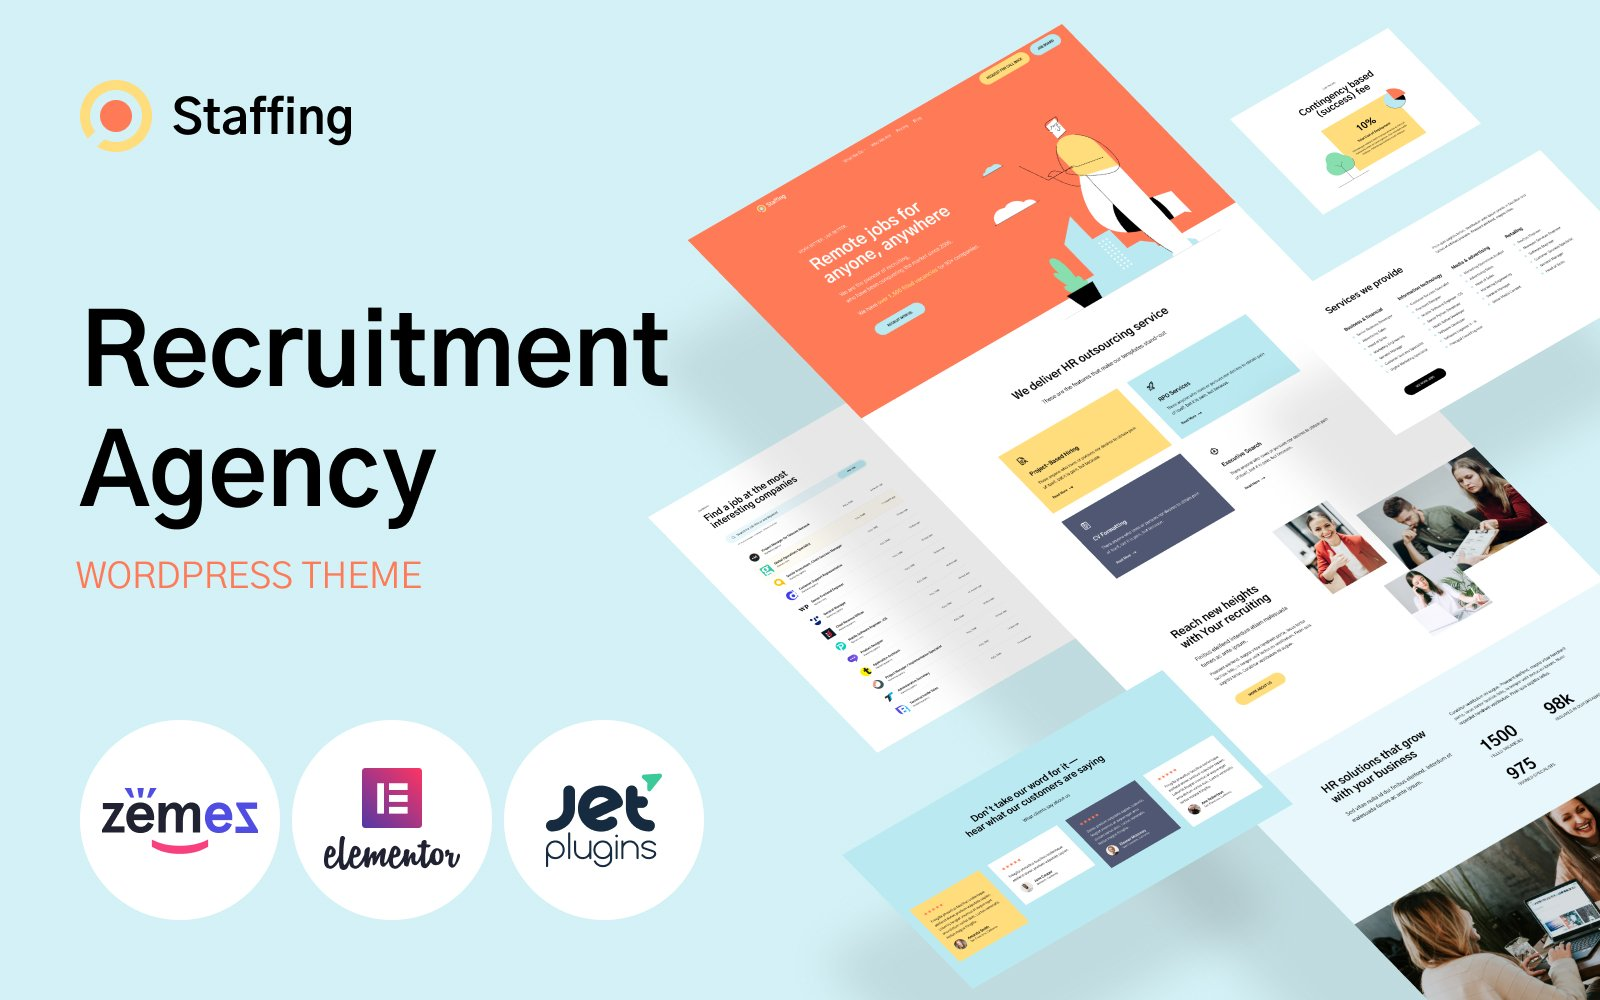 Staffing - Recruitment Agency Website Template WordPress Theme